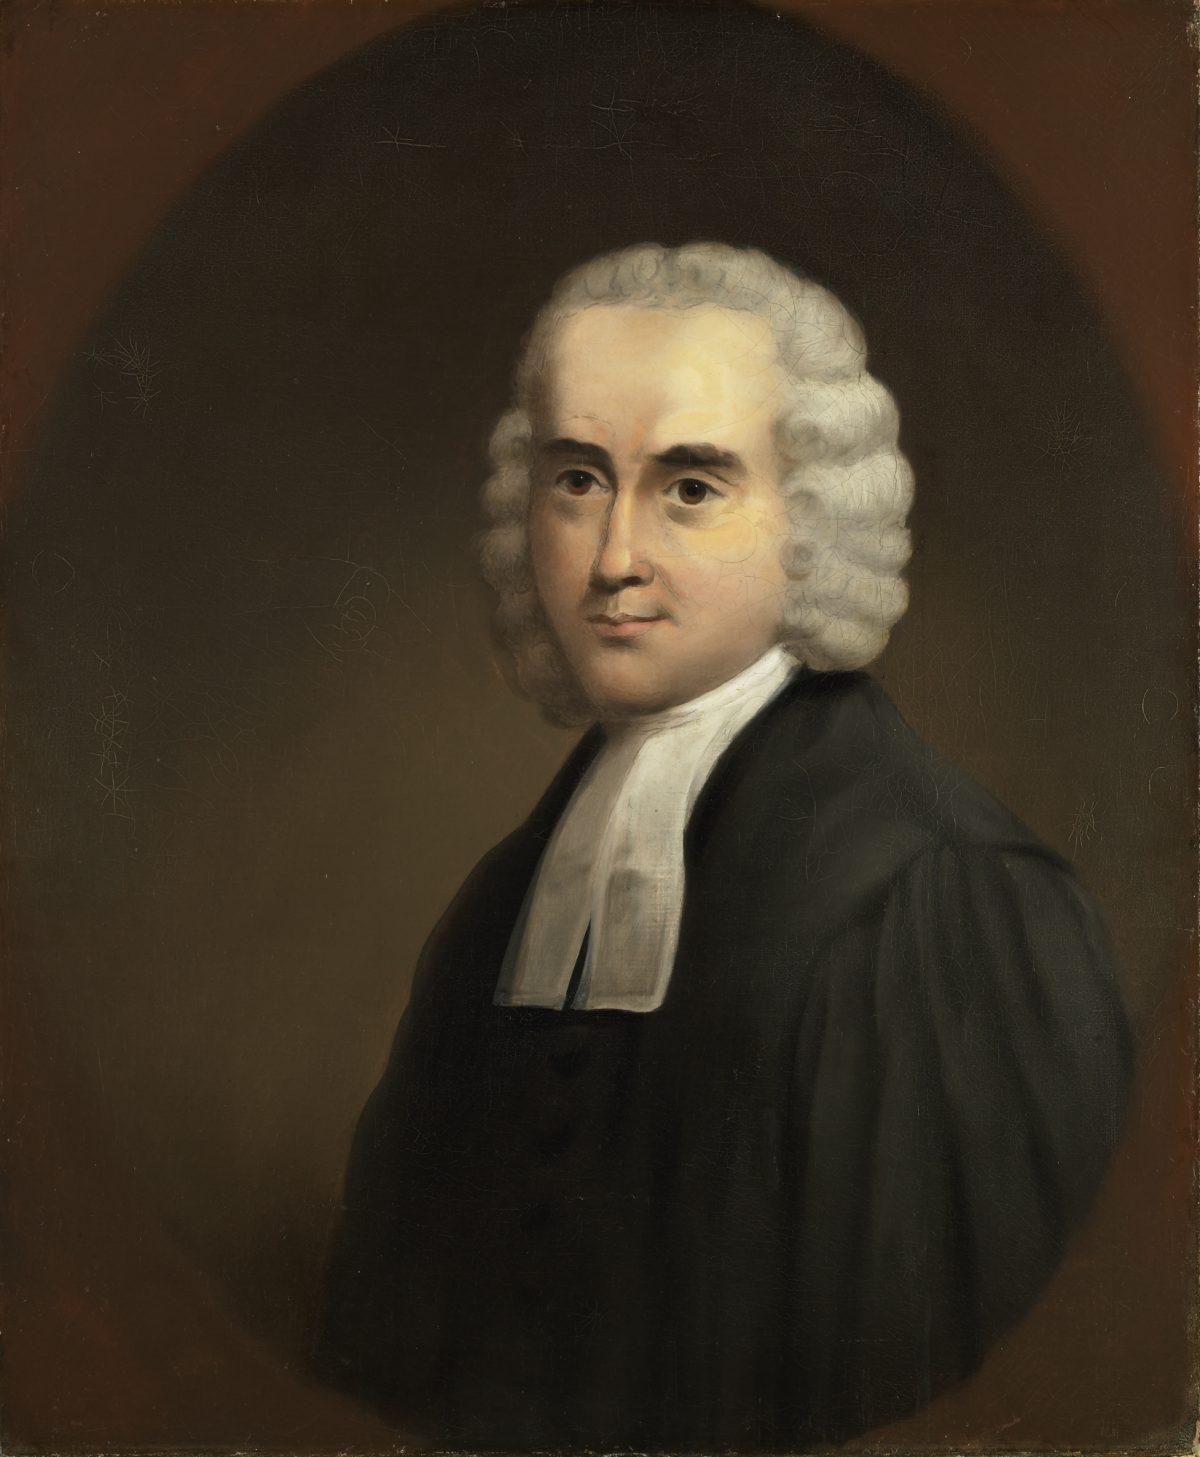 Jonathan Dickinson